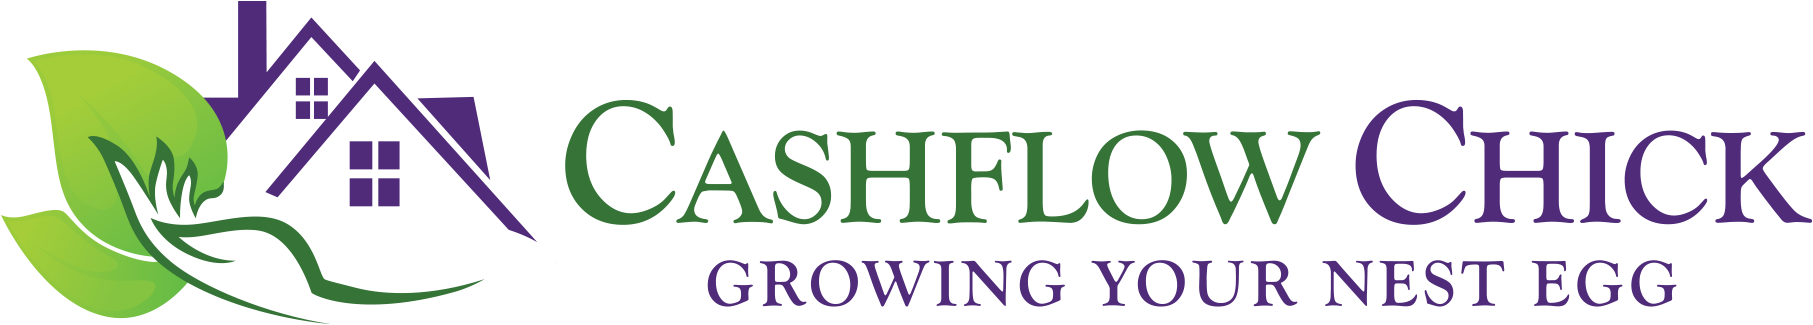 Cashflow Chick Logo